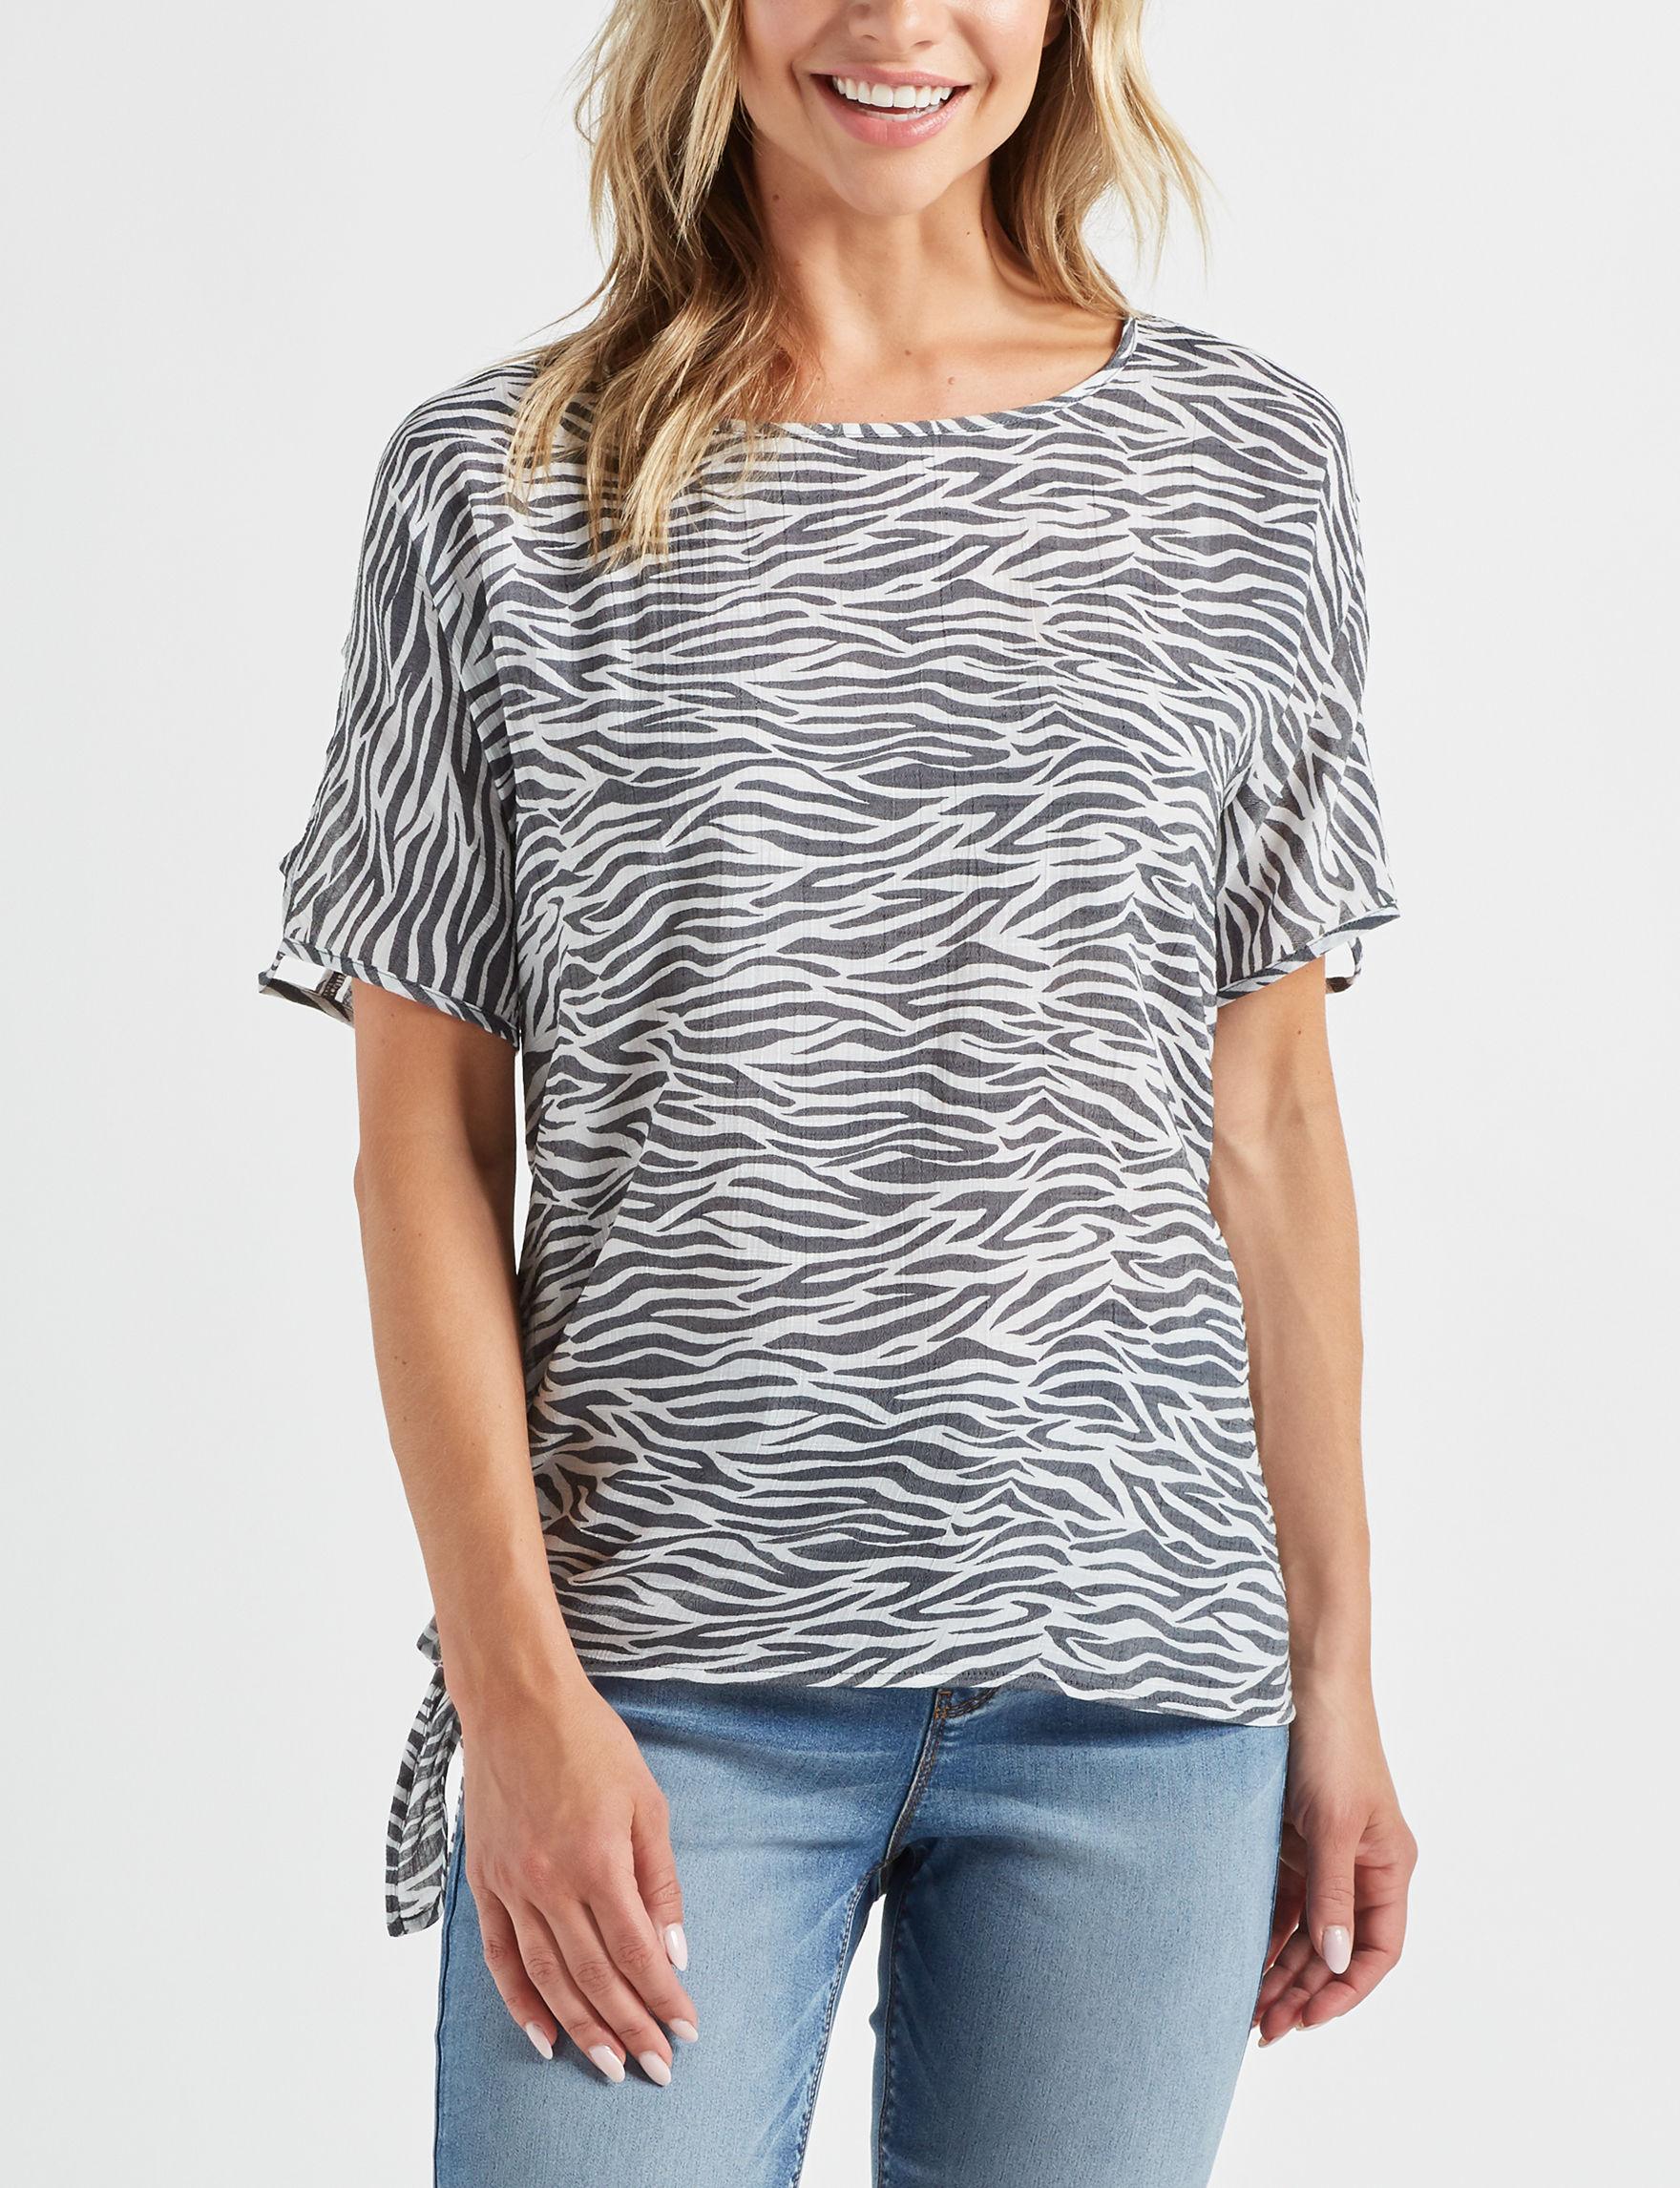 Como Vintage White / Black Shirts & Blouses